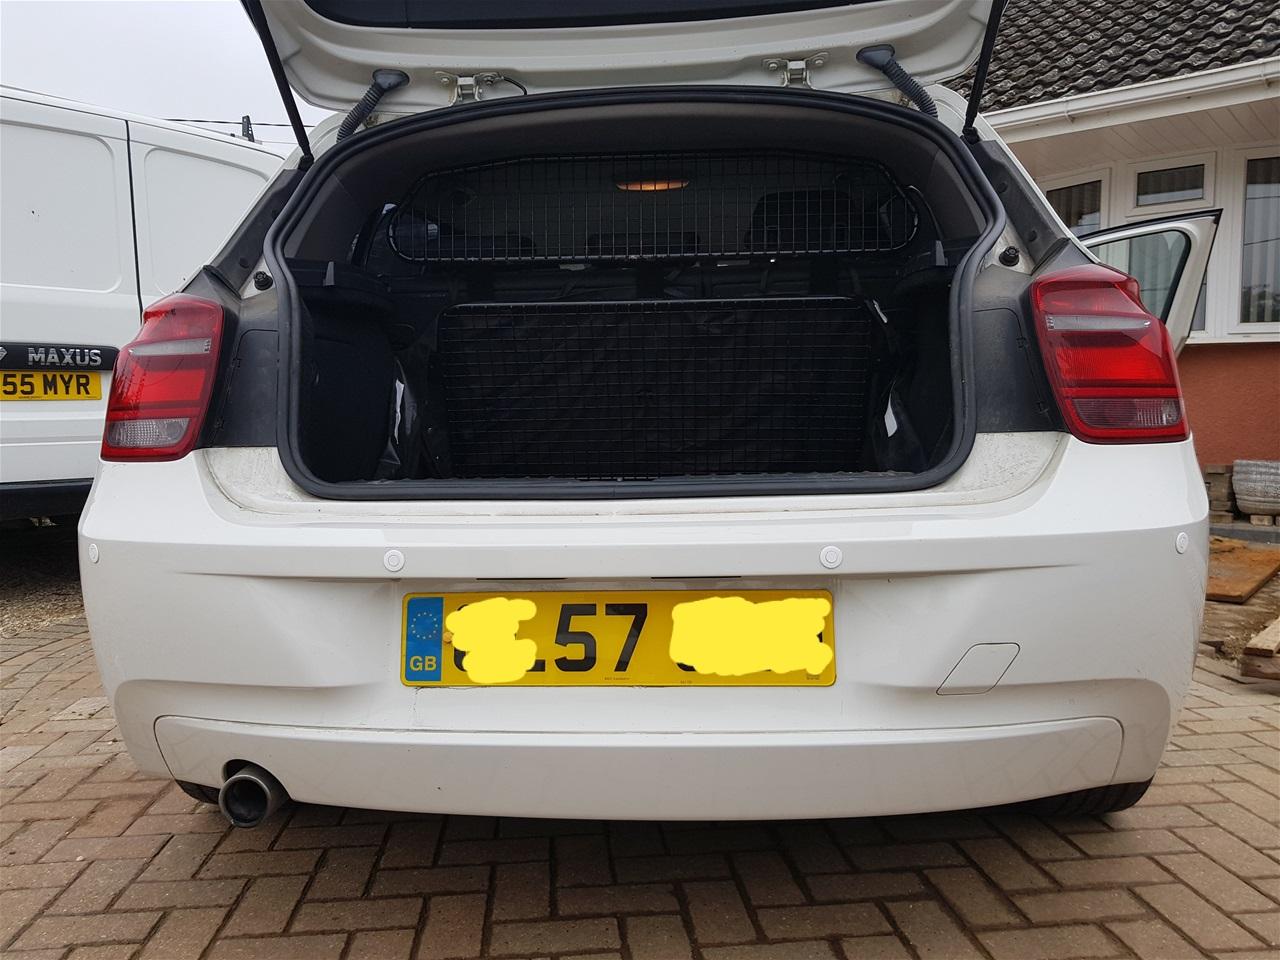 BMW 1 Series rear parking sensors